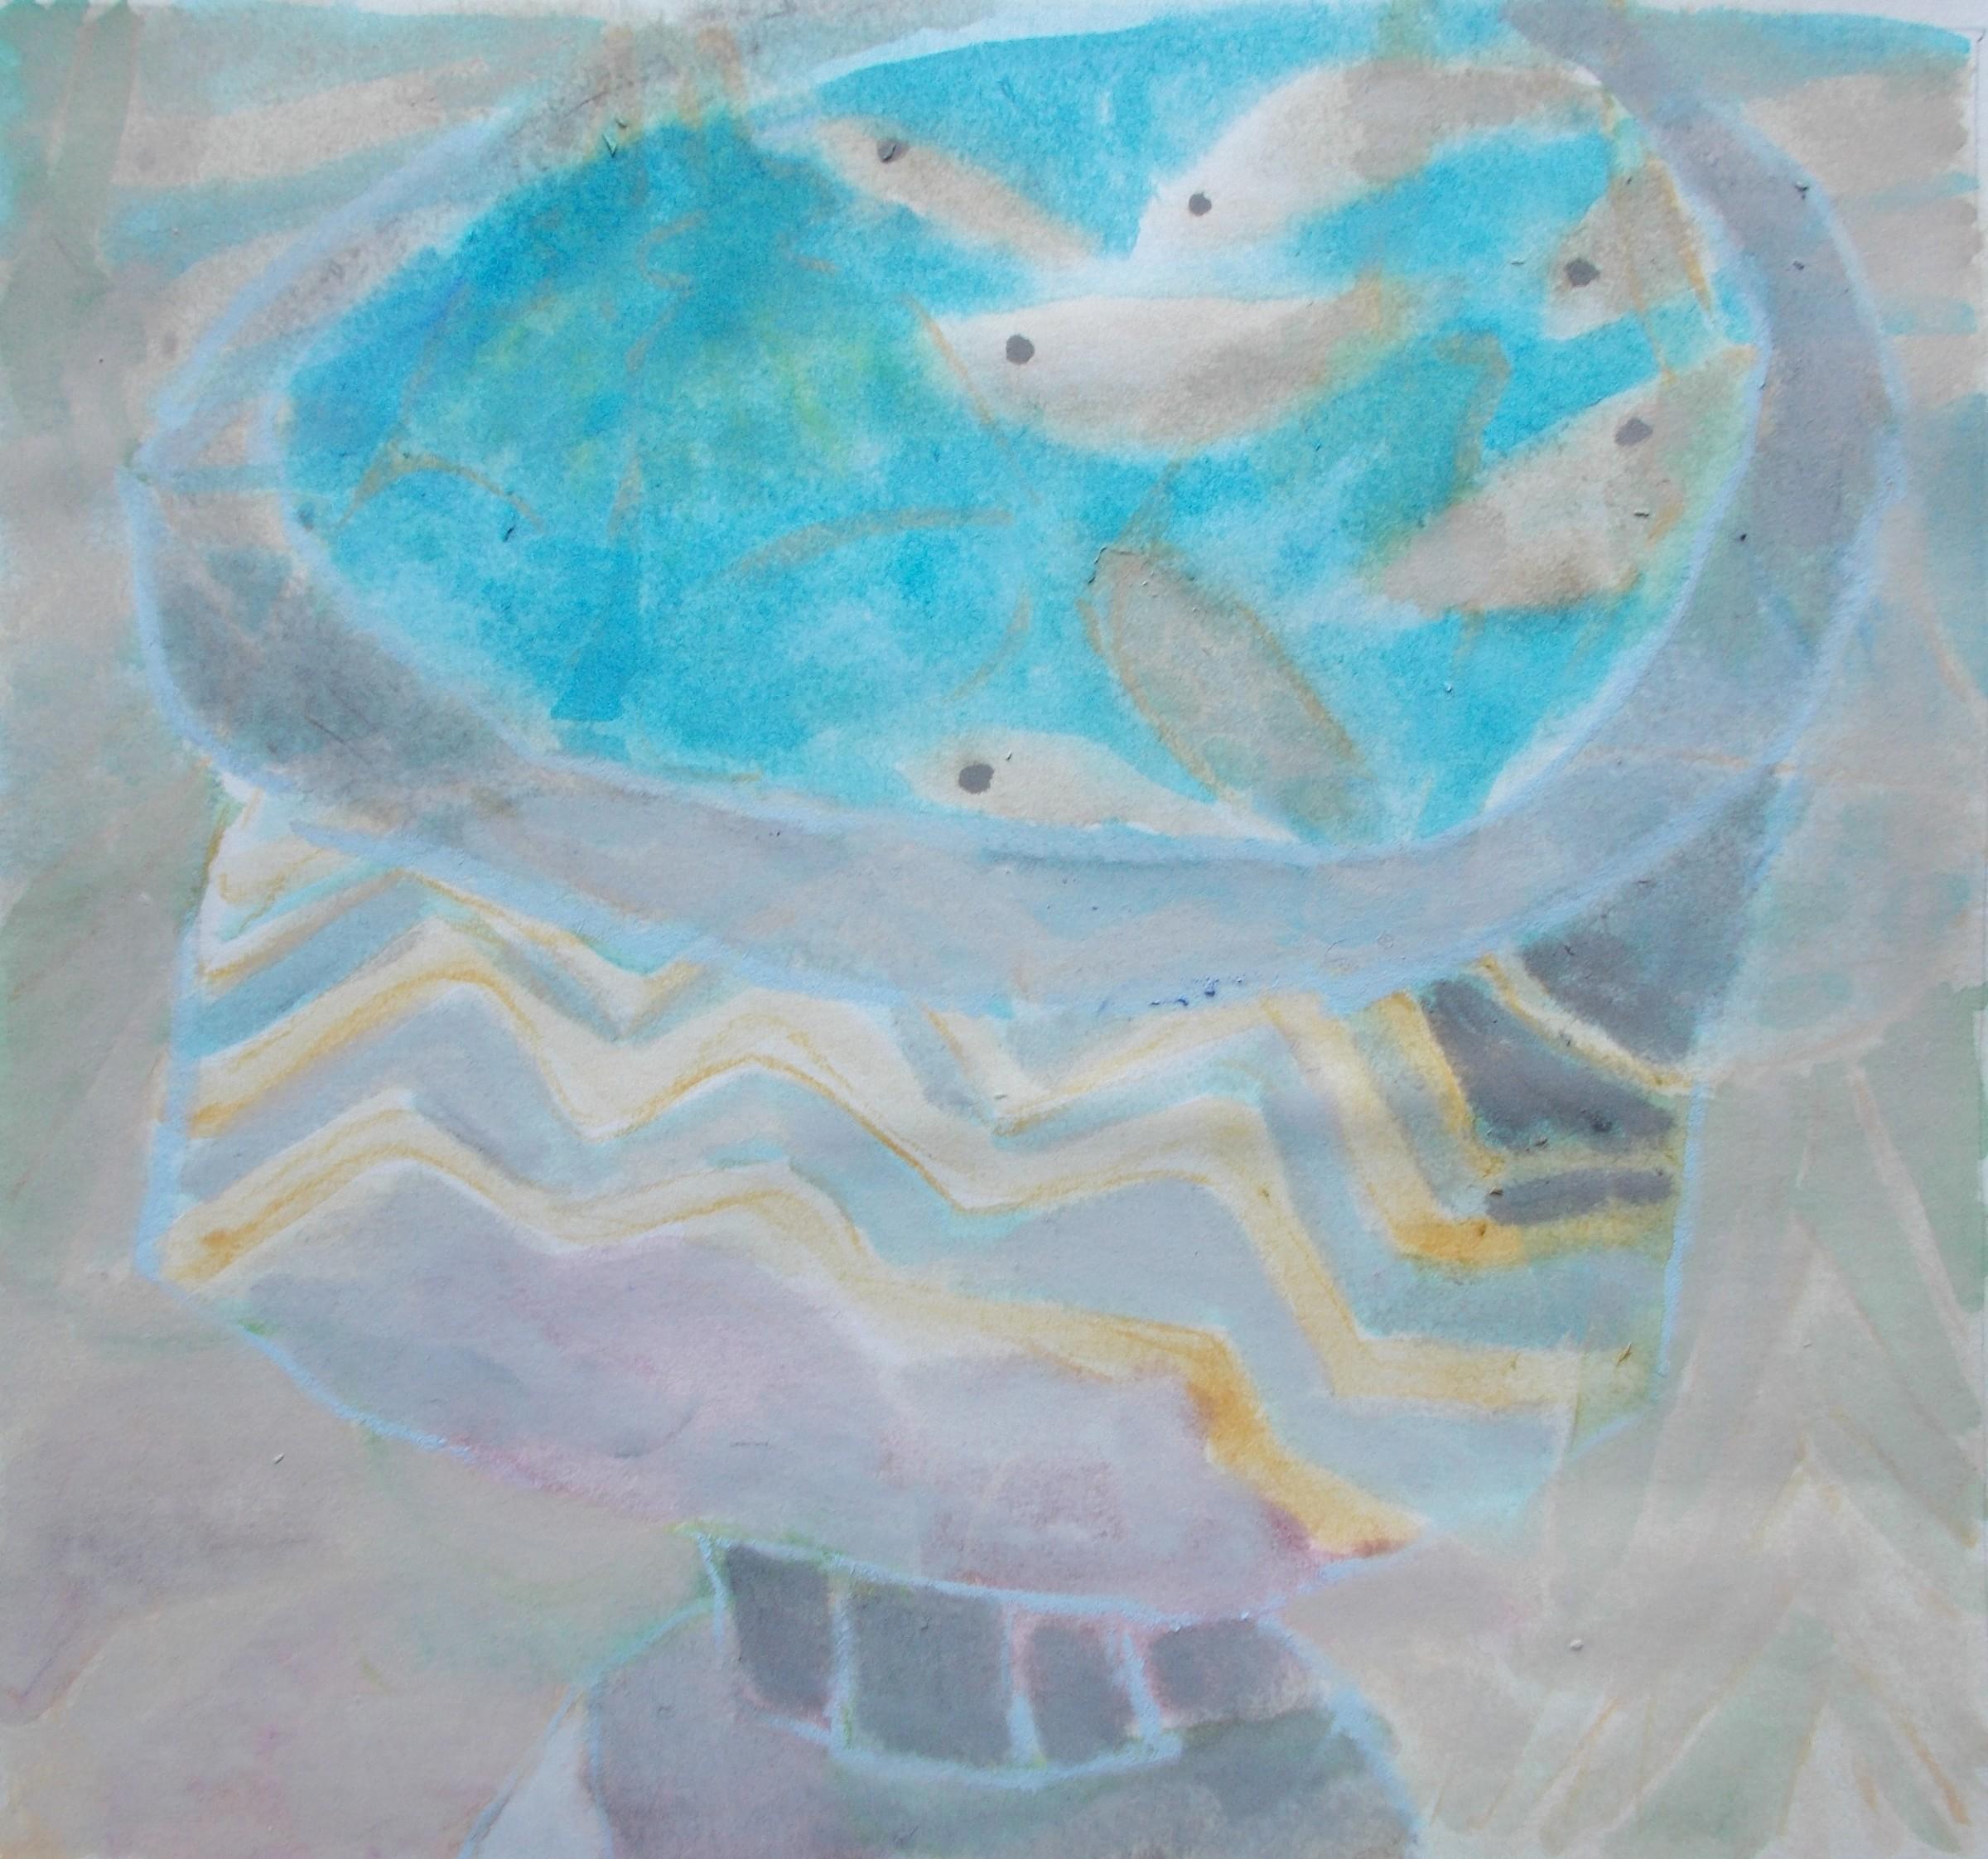 <span class=&#34;link fancybox-details-link&#34;><a href=&#34;/exhibitions/24/works/artworks_standalone10737/&#34;>View Detail Page</a></span><div class=&#34;artist&#34;><span class=&#34;artist&#34;><strong>Anne Marlow</strong></span></div><div class=&#34;title&#34;><em>Urn and Fishes</em></div><div class=&#34;medium&#34;>watercolour & pastel</div><div class=&#34;dimensions&#34;>46x45cm</div>